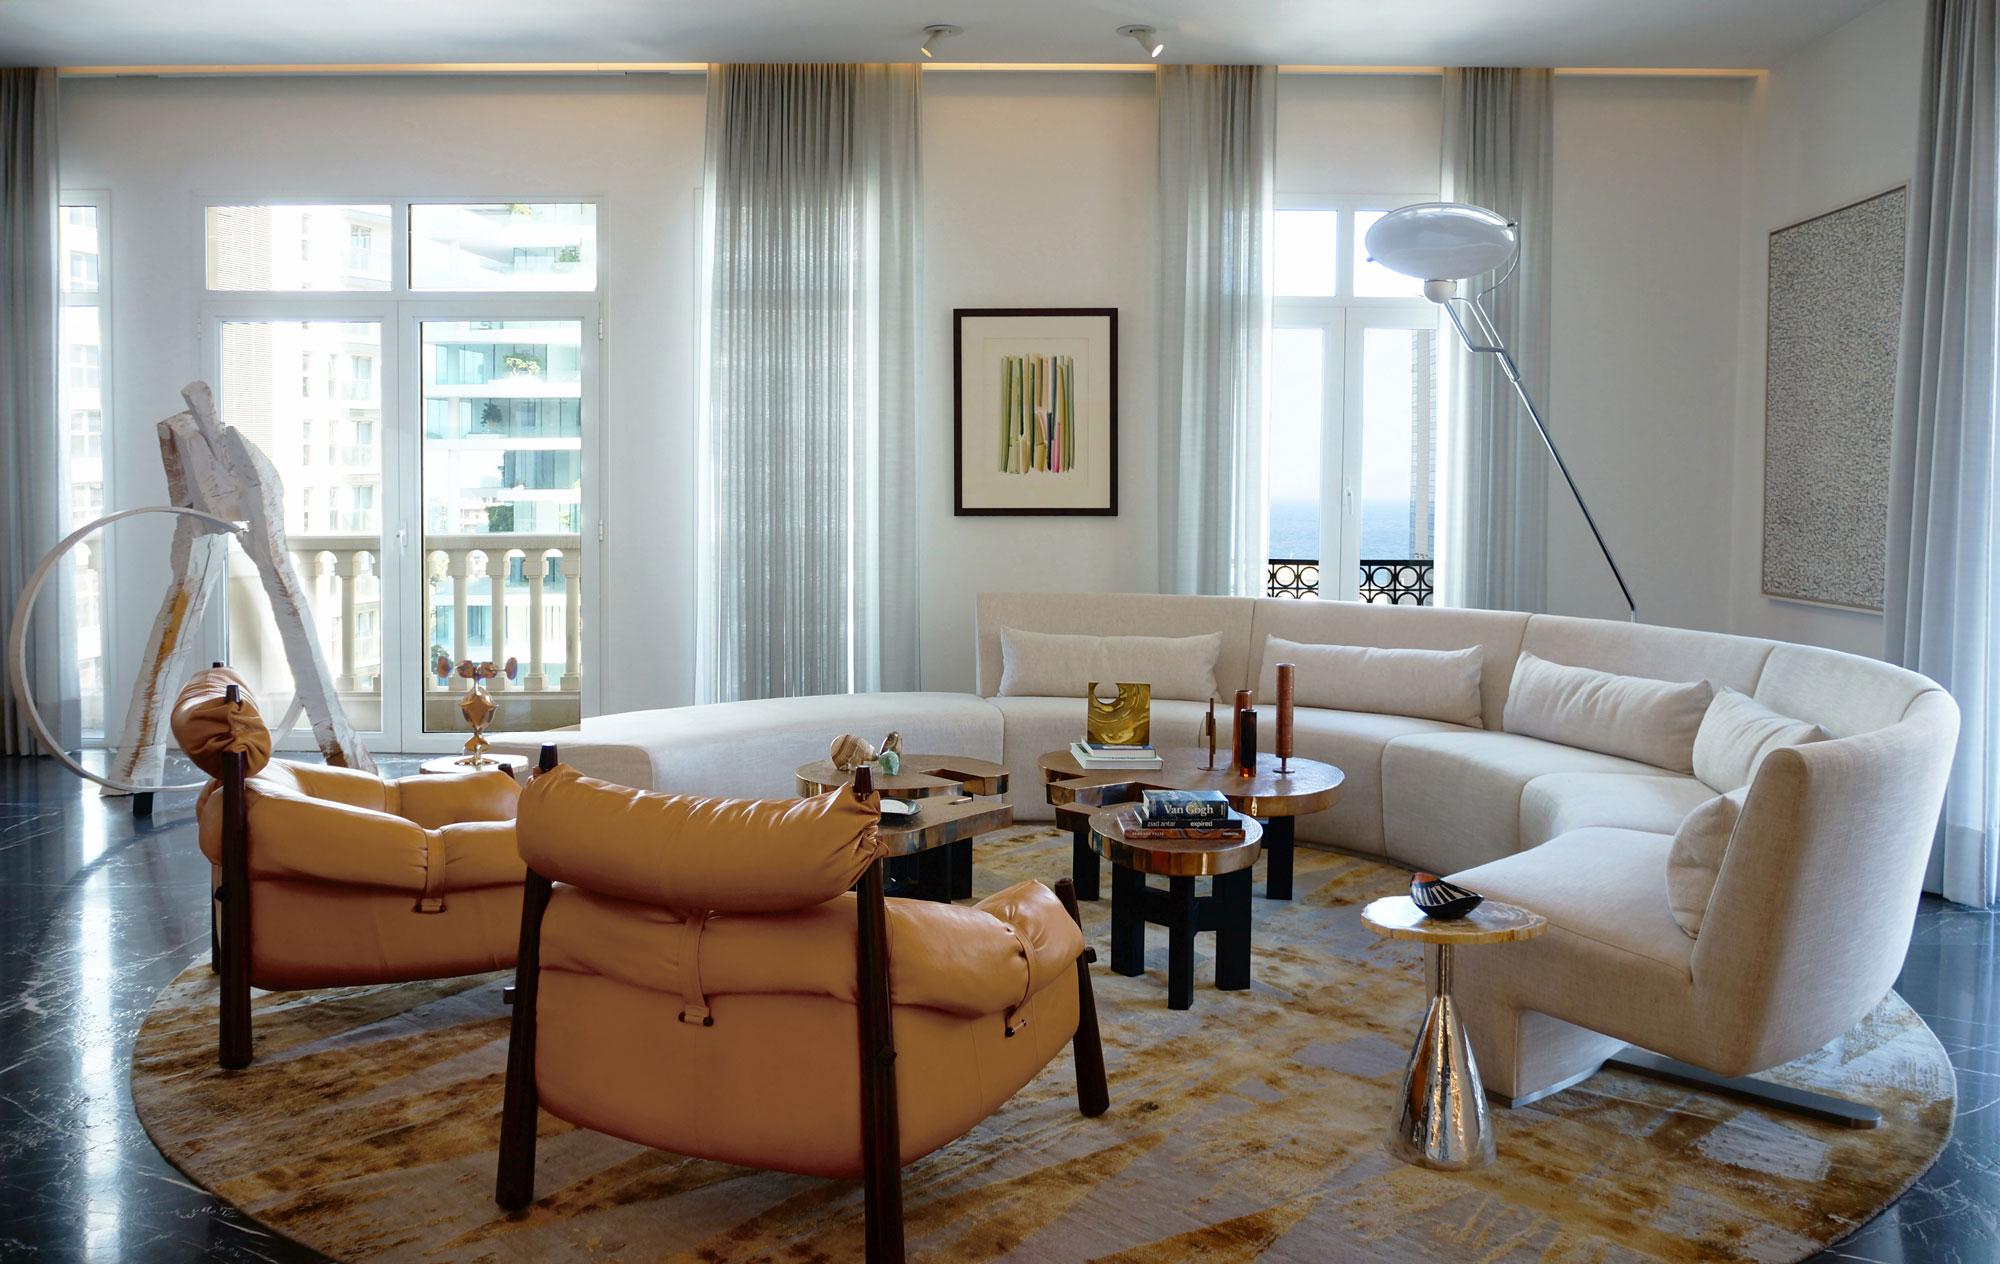 gatserelia design - top interior designers - living rooms - living room ideas - photography by ewa szumilas